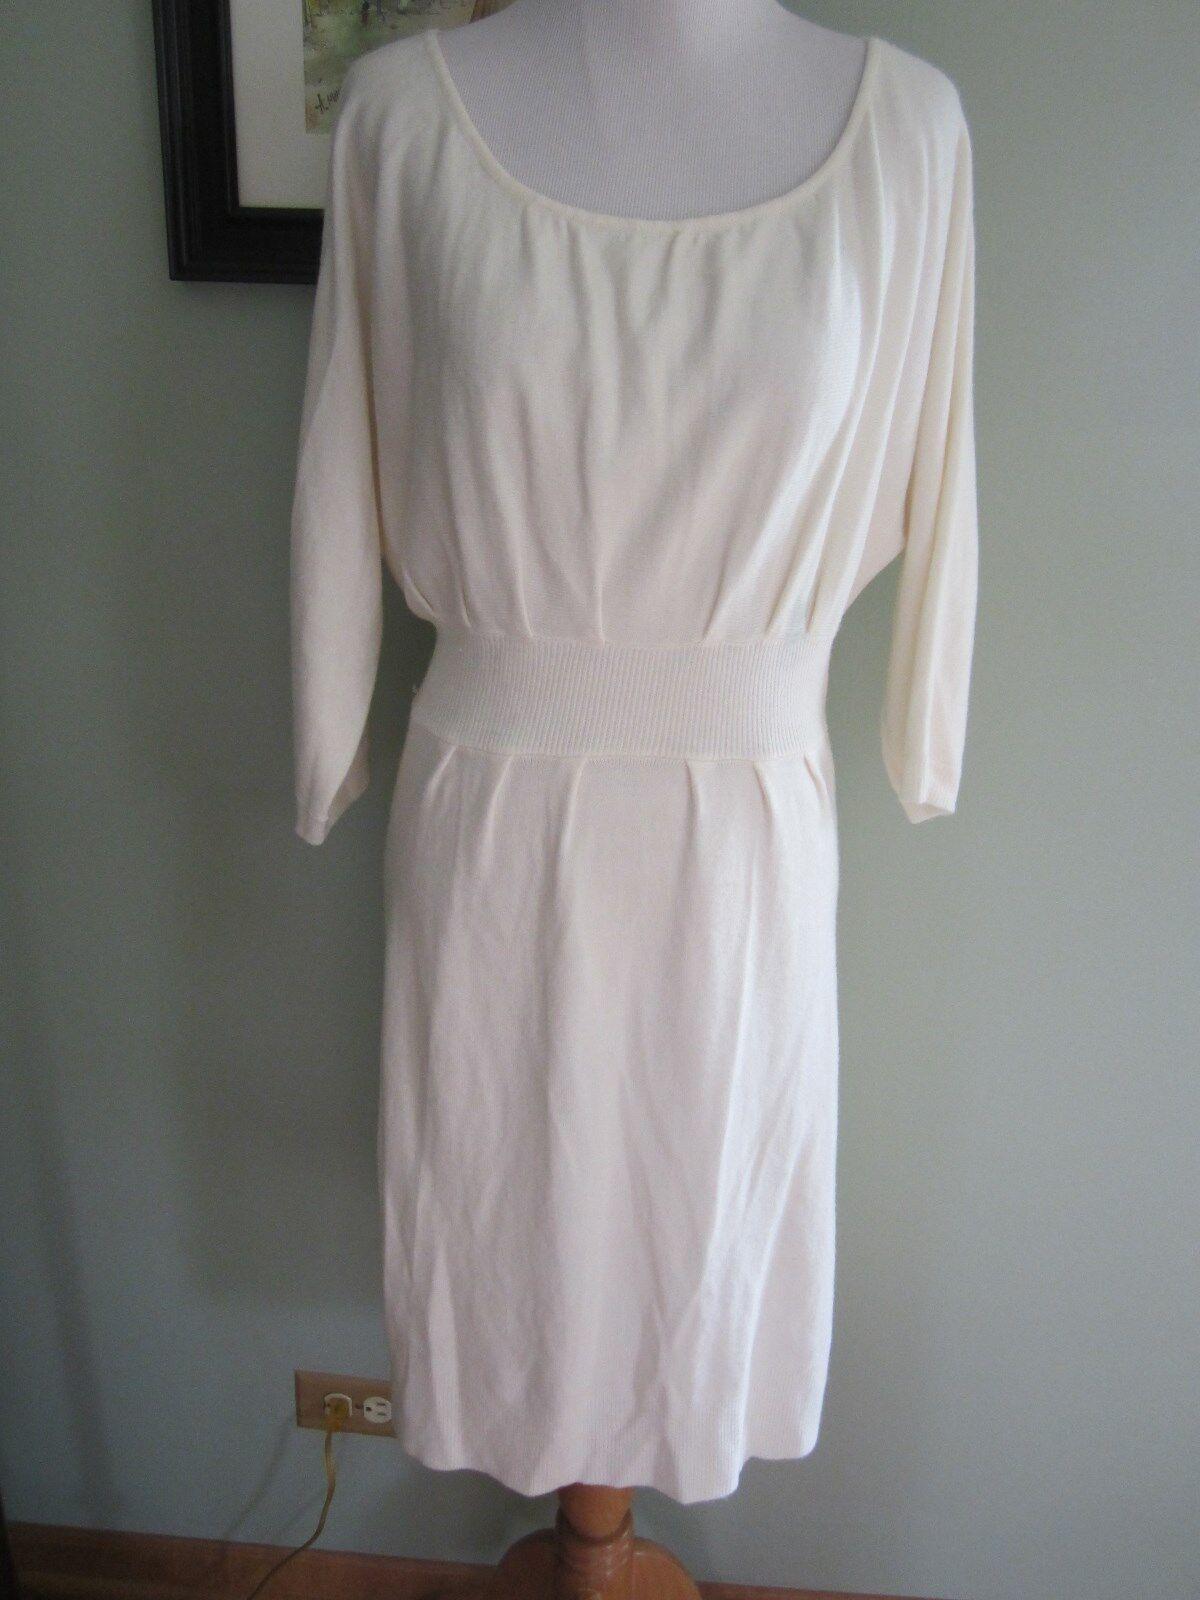 Arden B Ivory Cream 3 4 Sleeves Acrylic Sweater Dress Size L